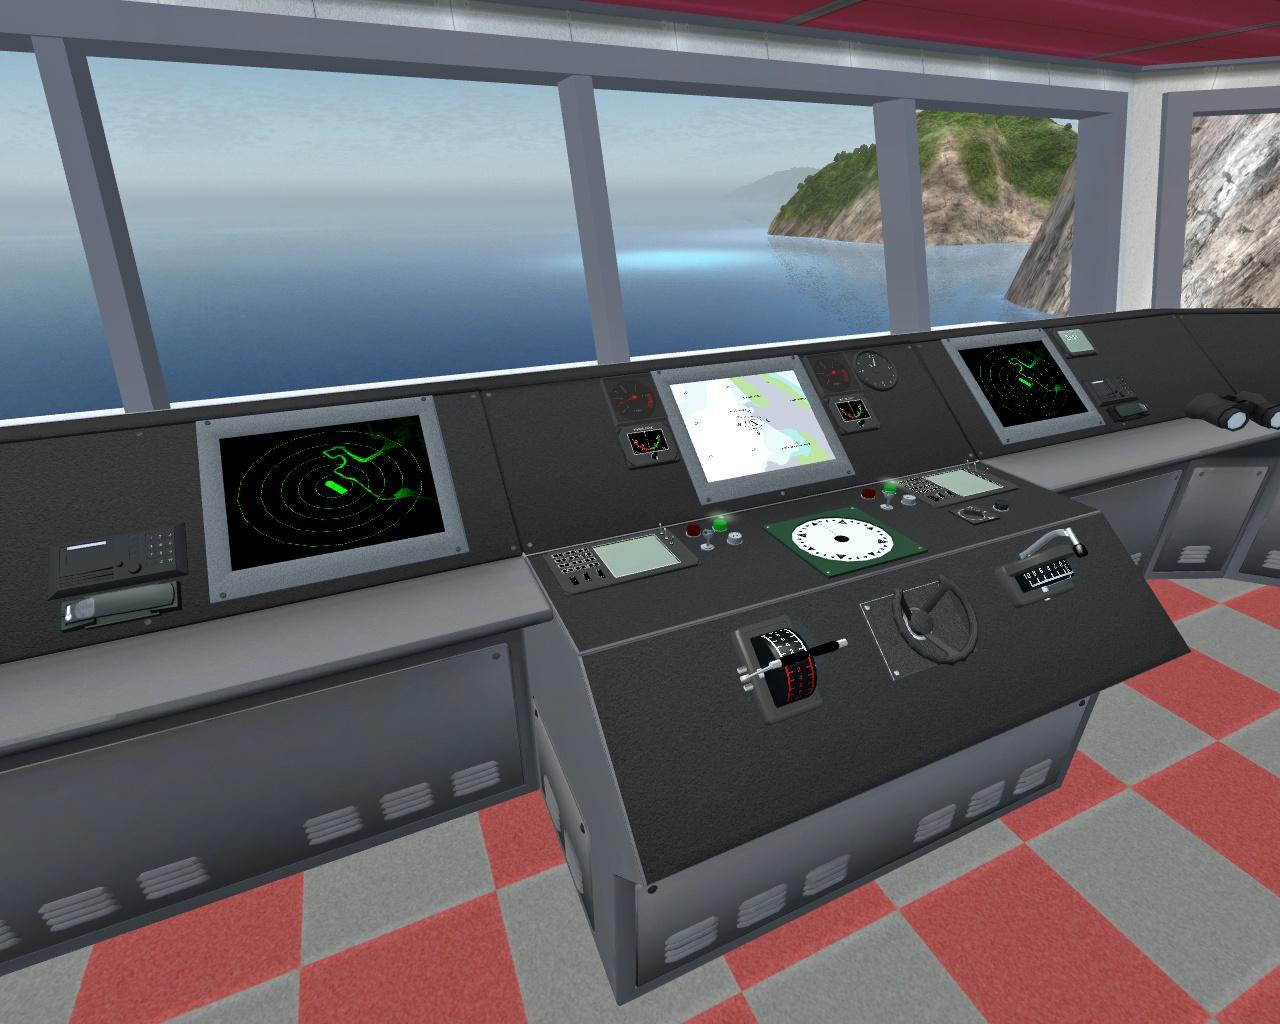 http://4.bp.blogspot.com/-hEIe4NaI8Sc/TnqTPDTDWCI/AAAAAAAAOyY/2_k2oDEQcHk/s1600/ship+simulator2.jpg